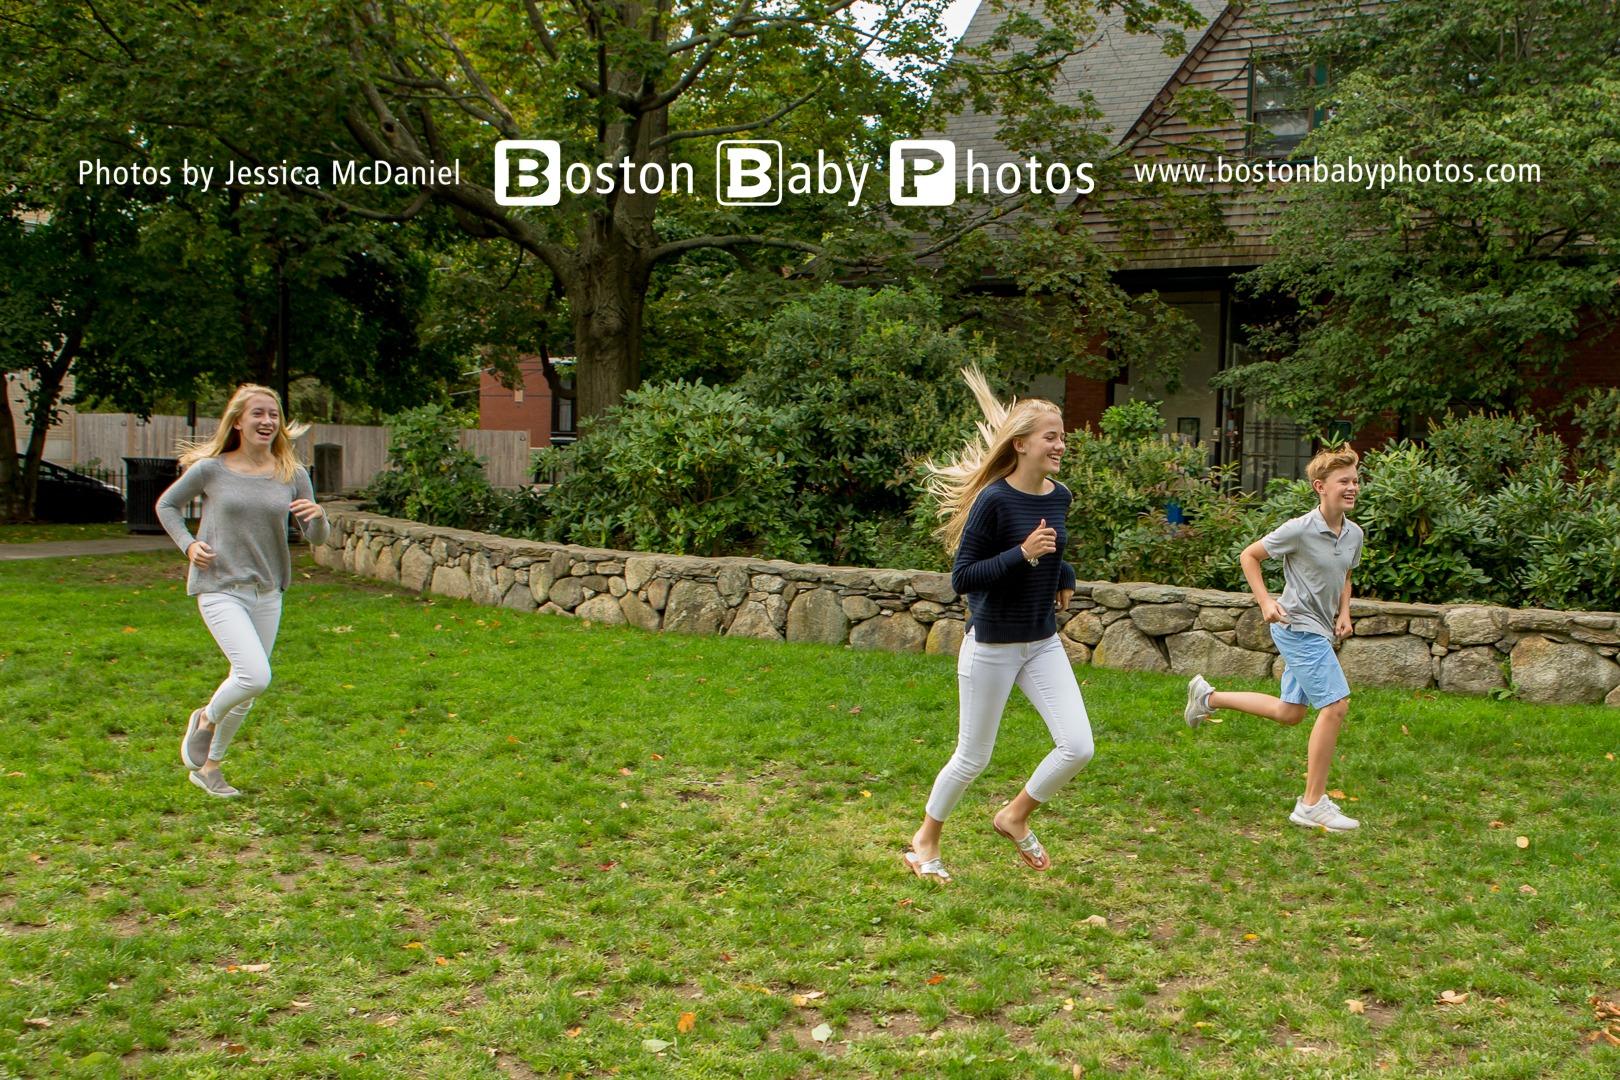 Brookline Teenager Photoshoot - Older kids have fun too